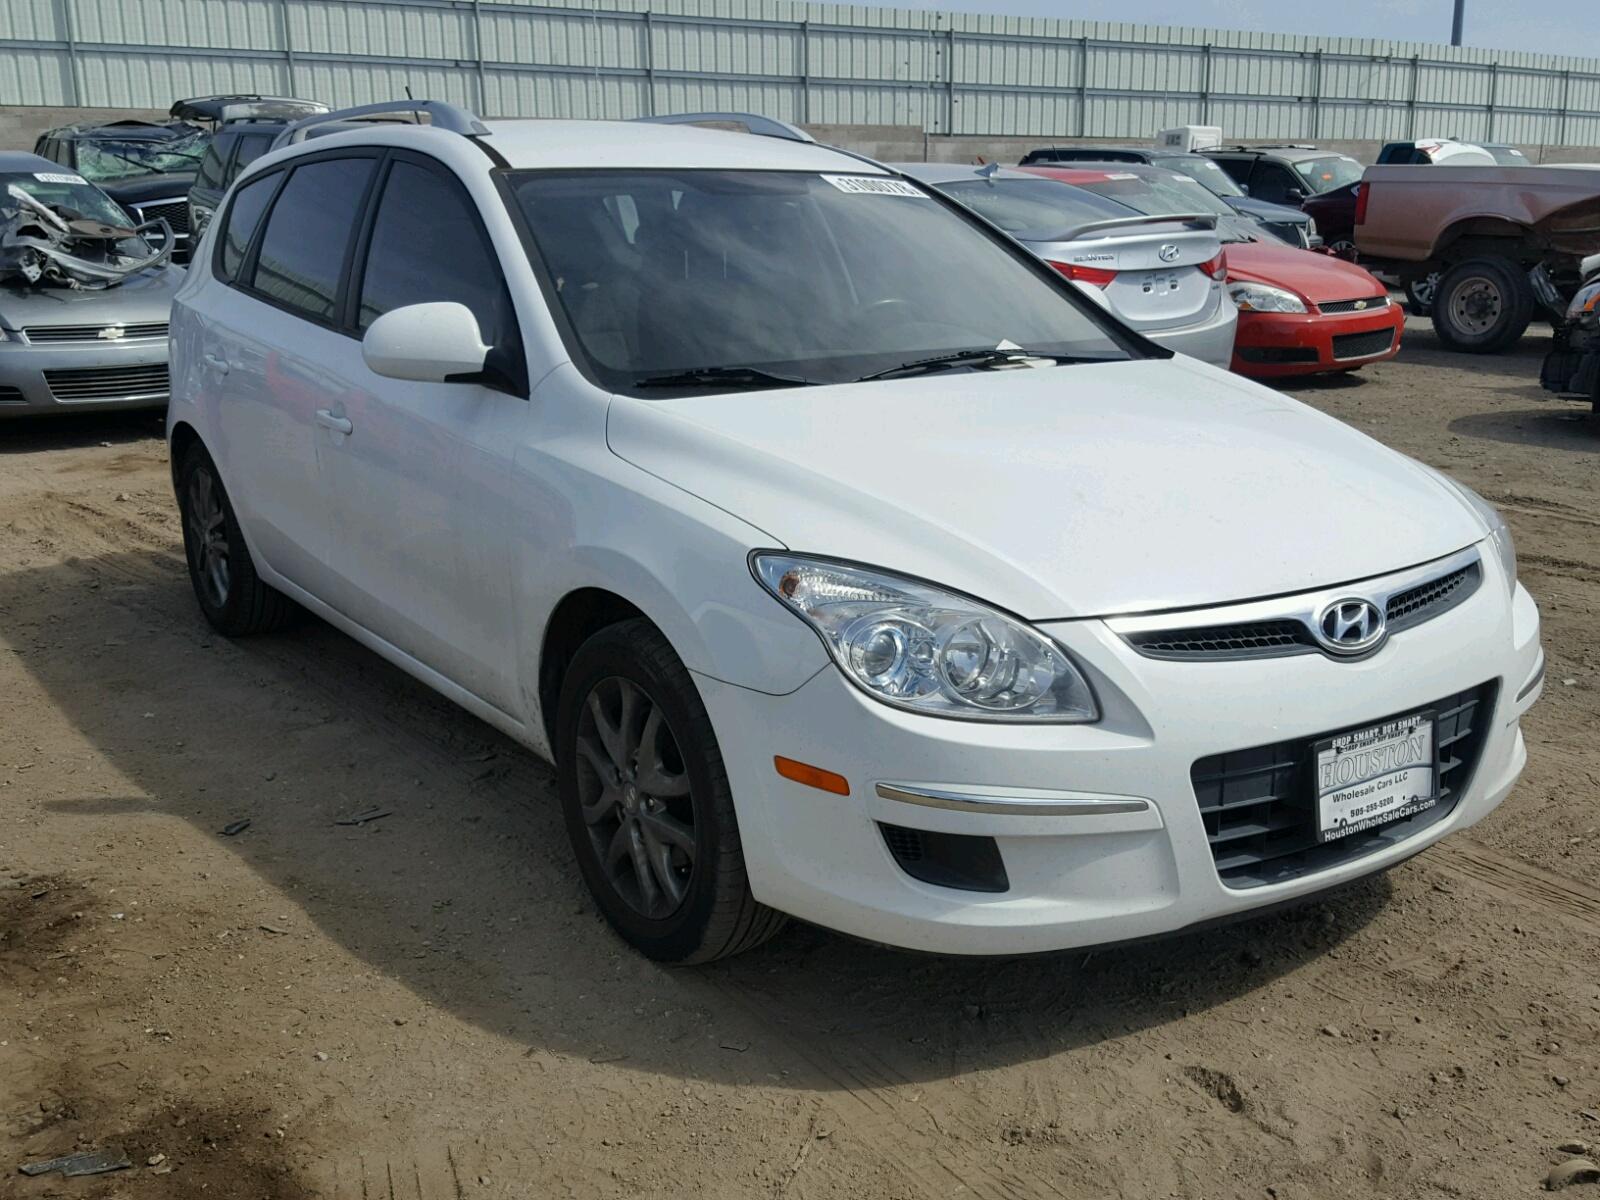 Auto Auction Ended on VIN KMHDH4AE4FU 2015 HYUNDAI ELANTRA in